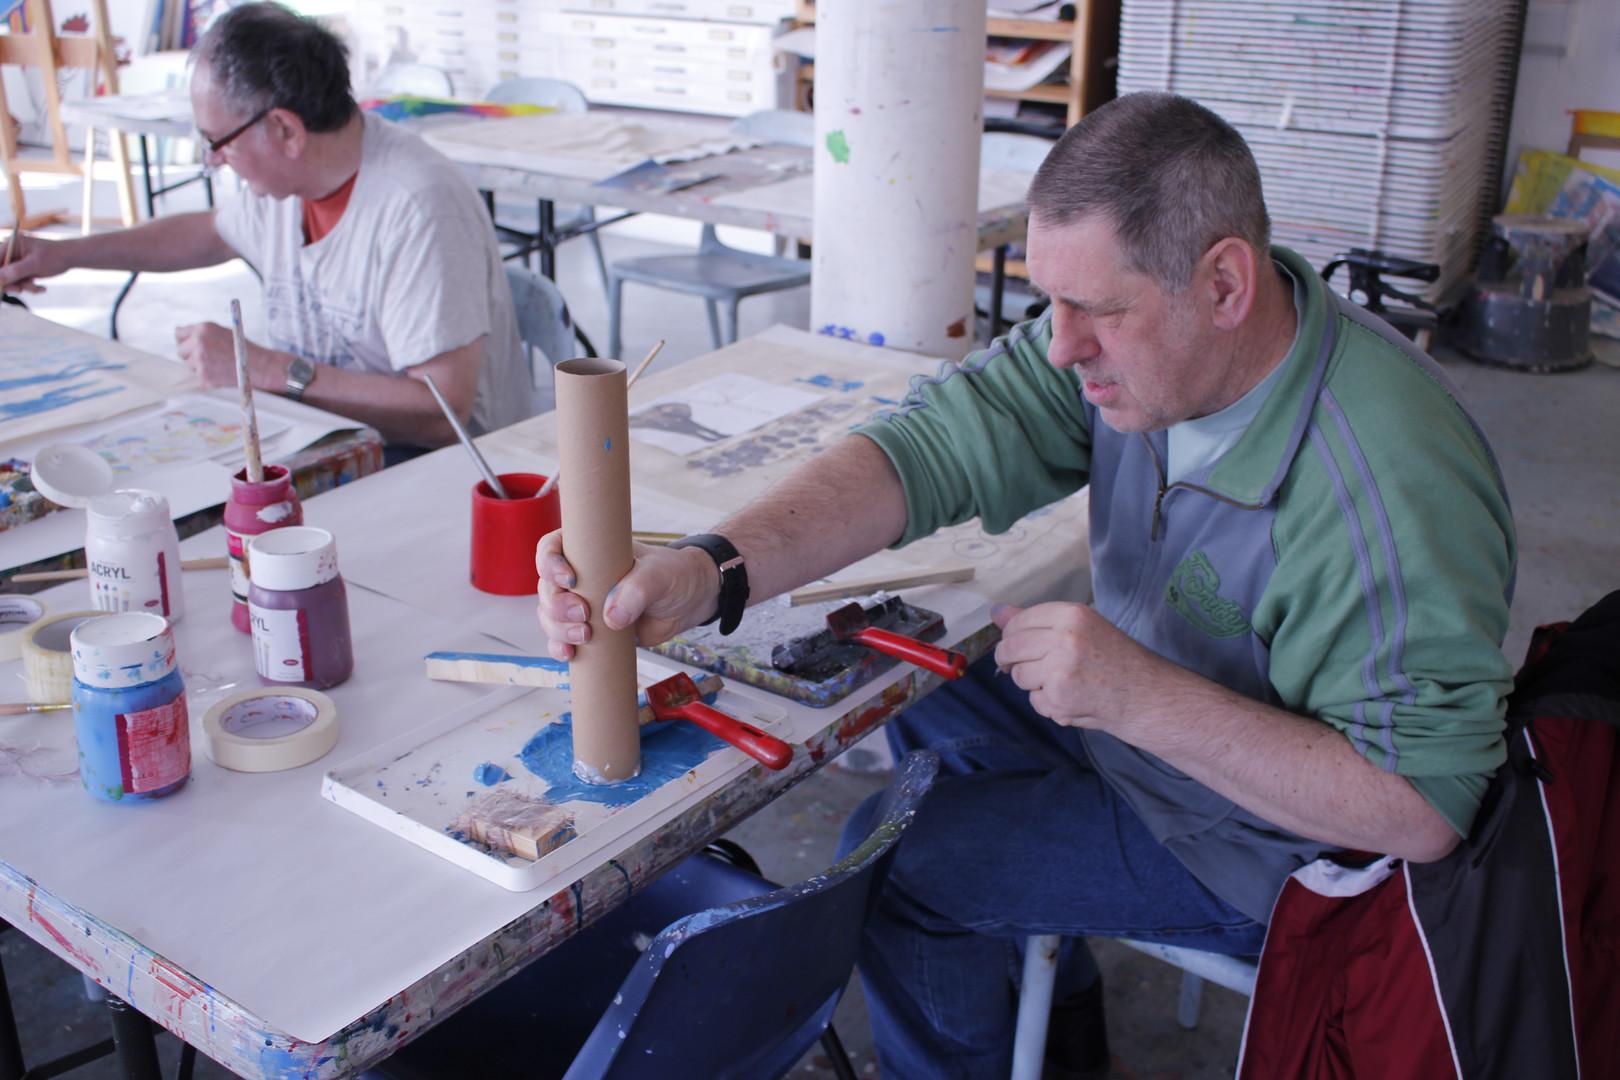 GOHAF 2017: Project Ability Workshop